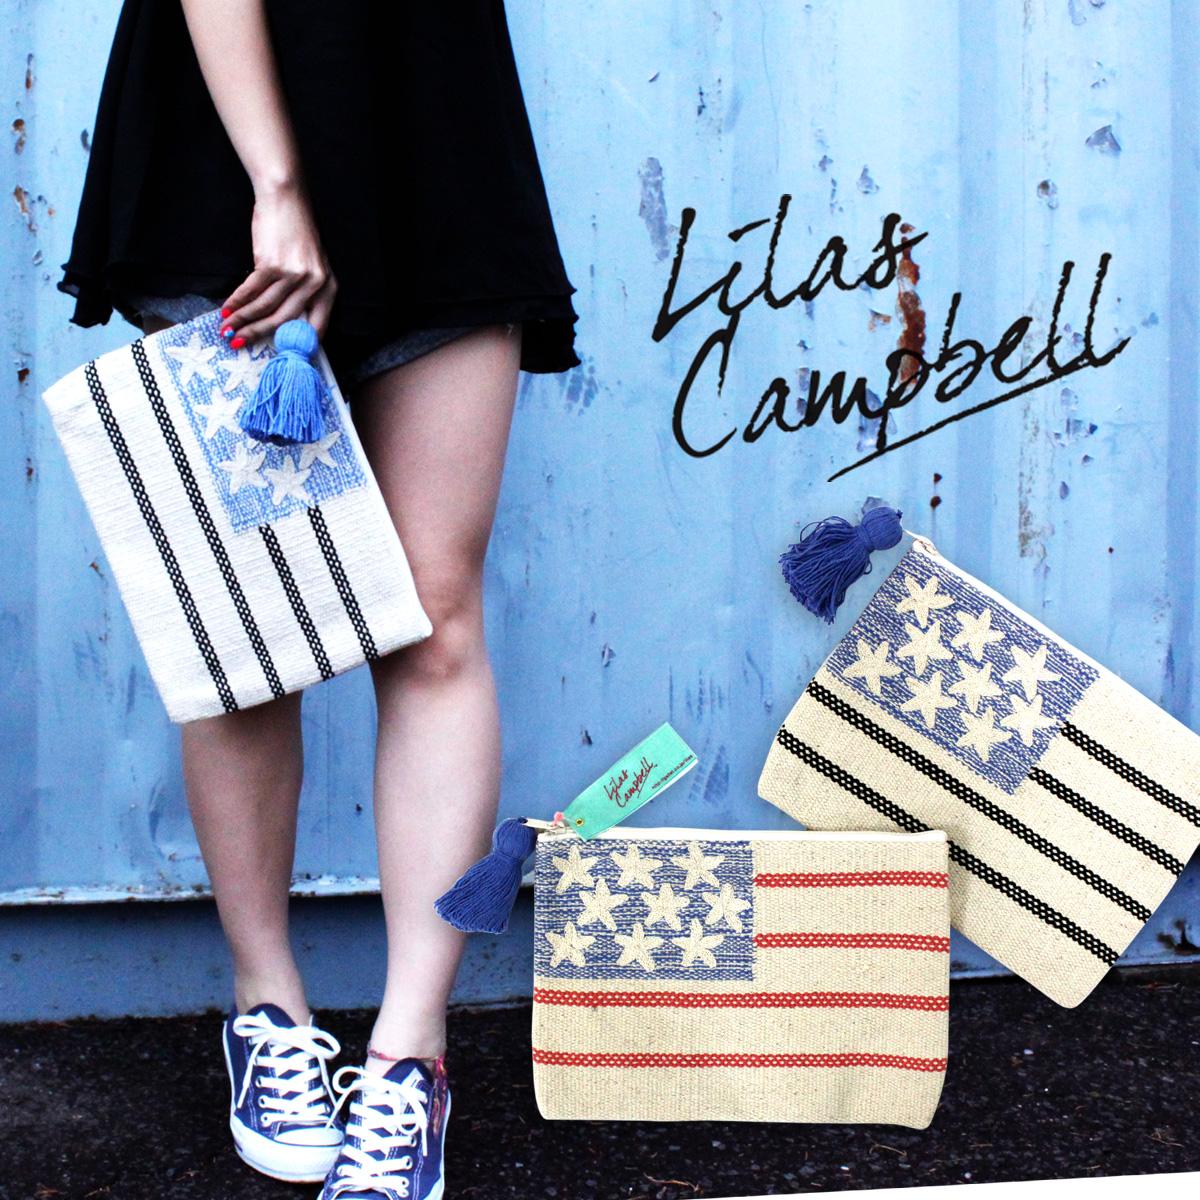 【23%OFF】Lilas Campbells リラキャンベル 2WAY CLUTCH BAG VINTAGE LAG